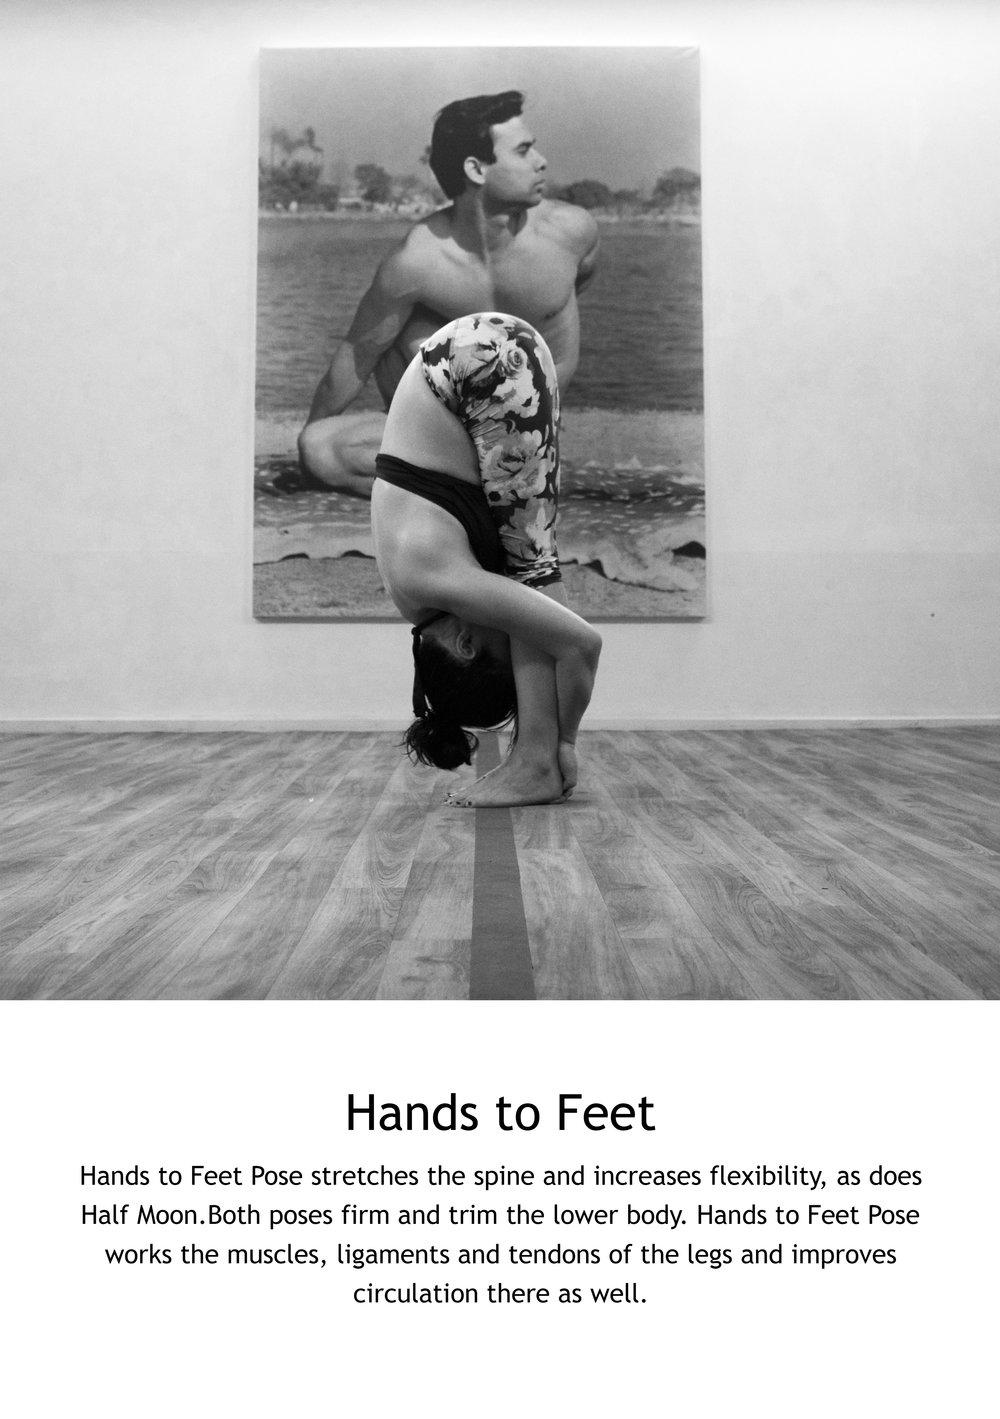 Hands to Feet